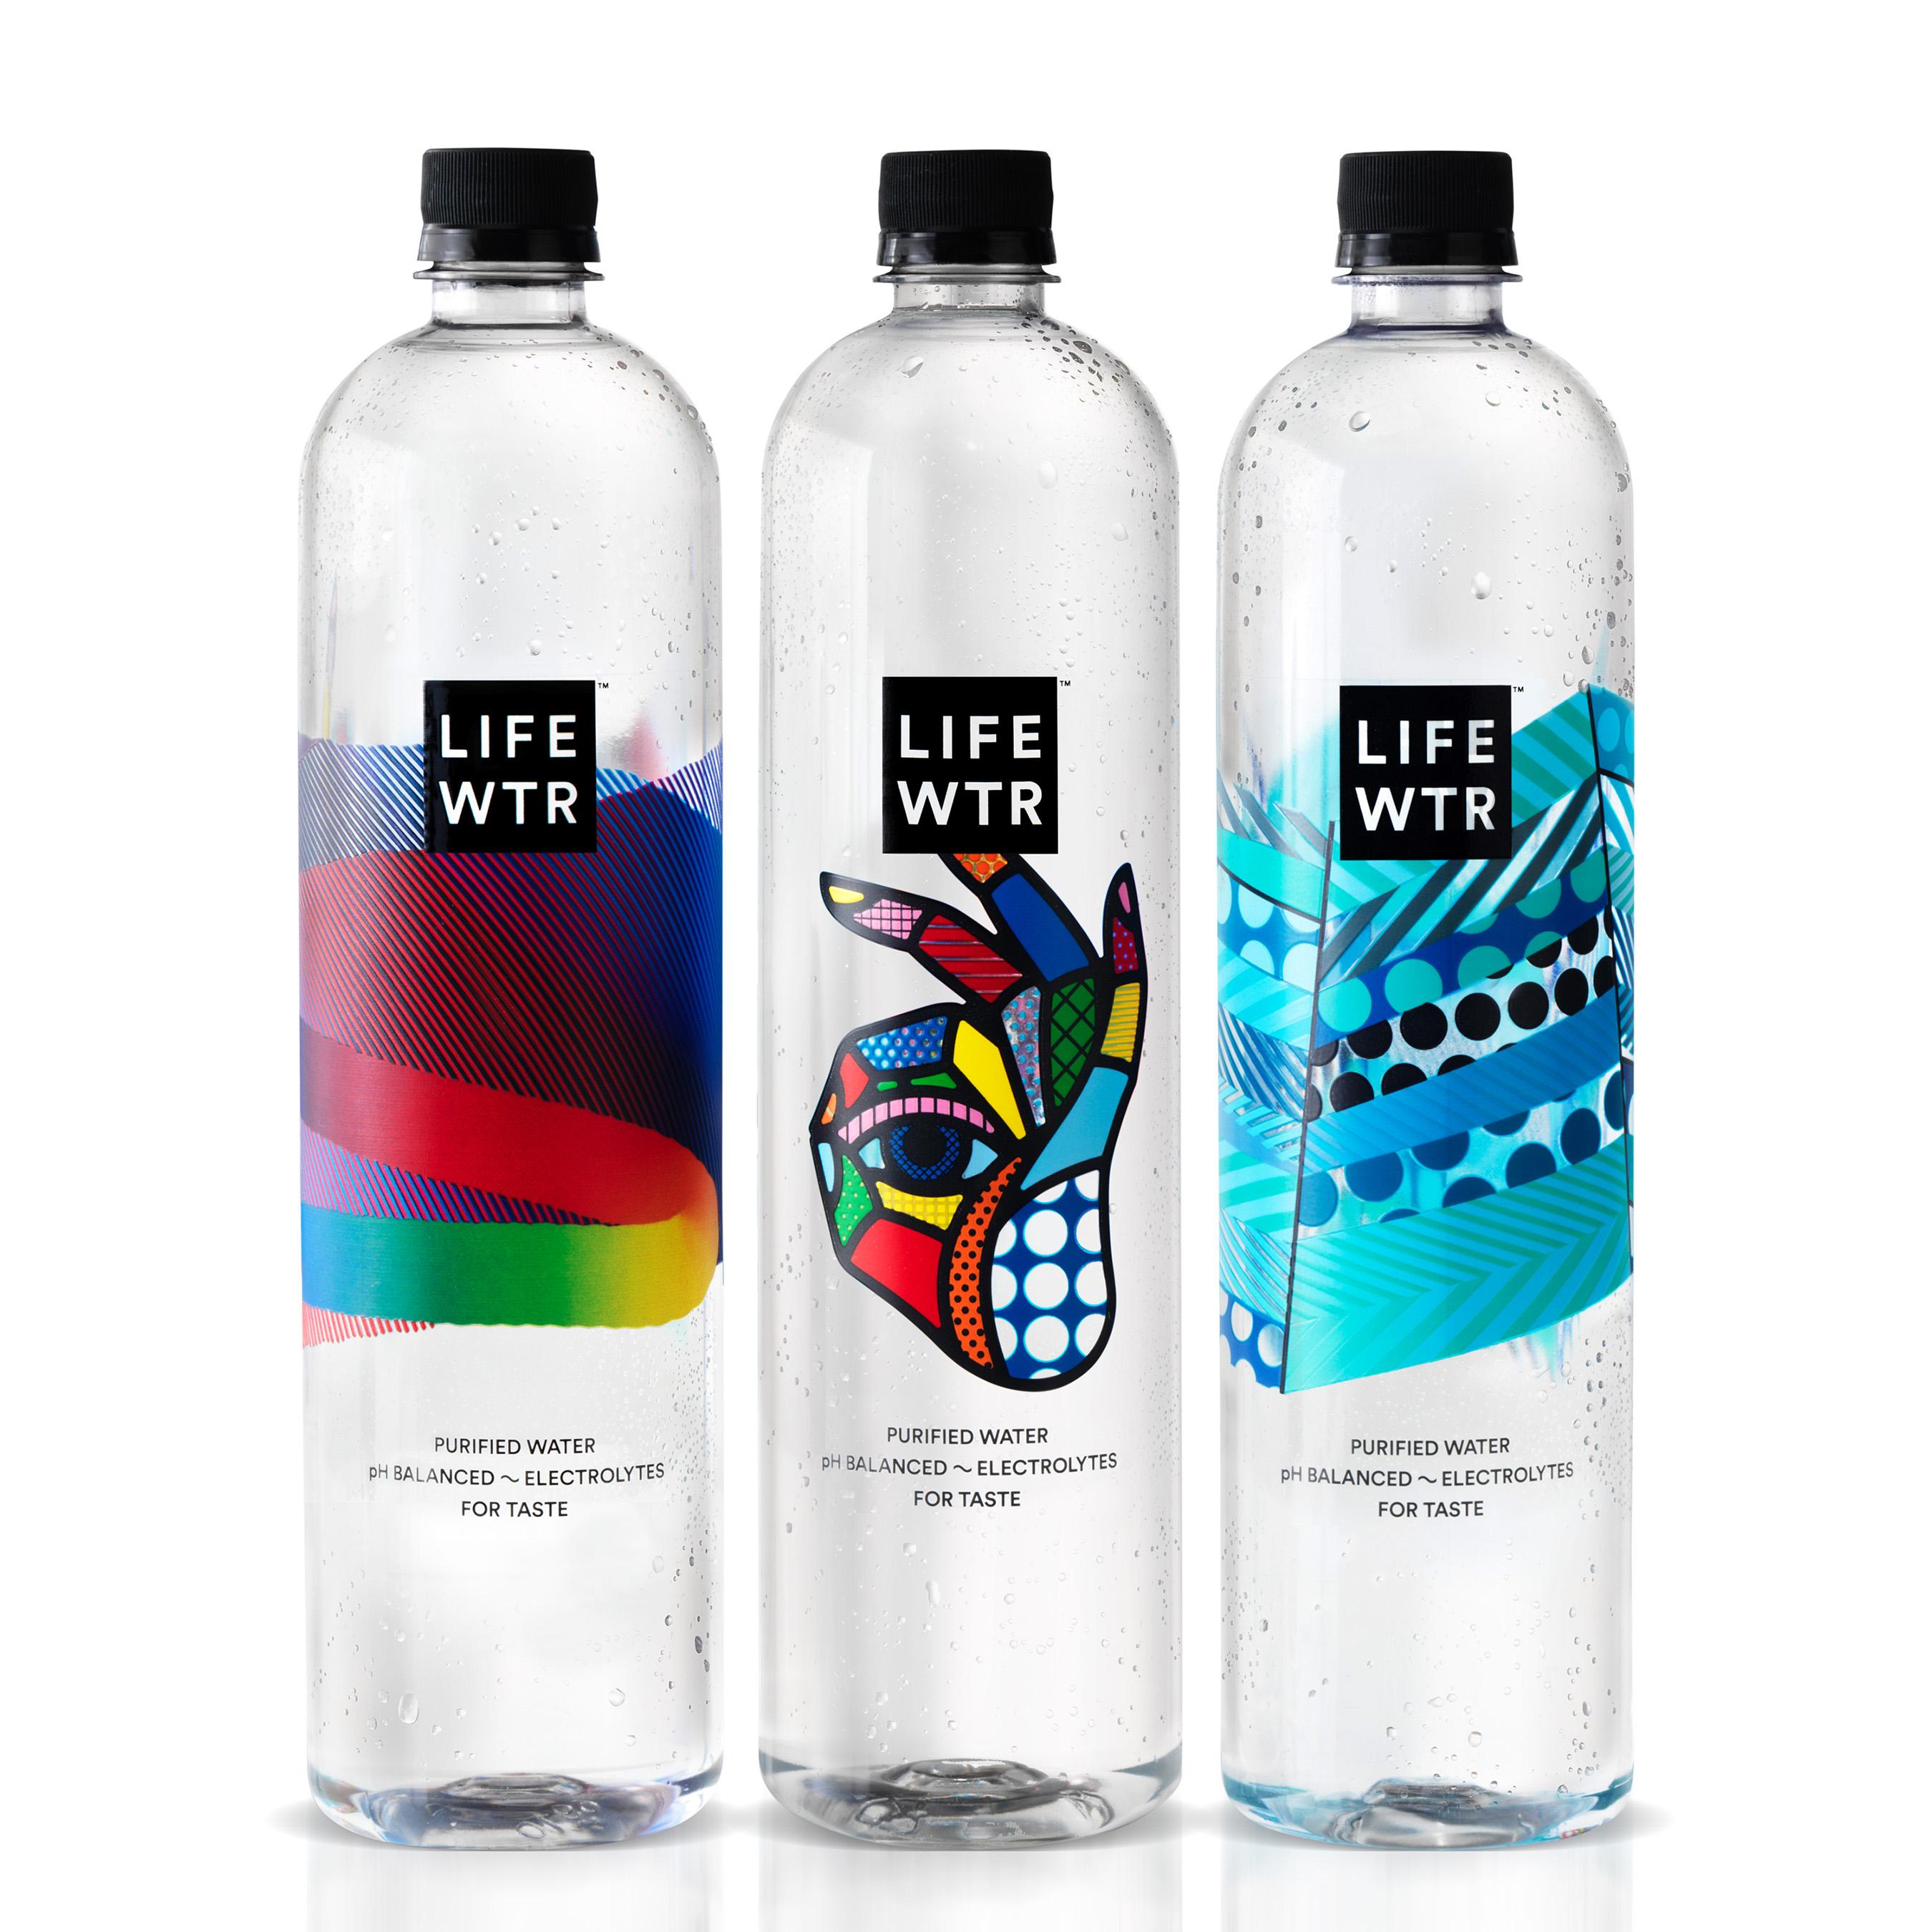 LIFEWTR: Bottles